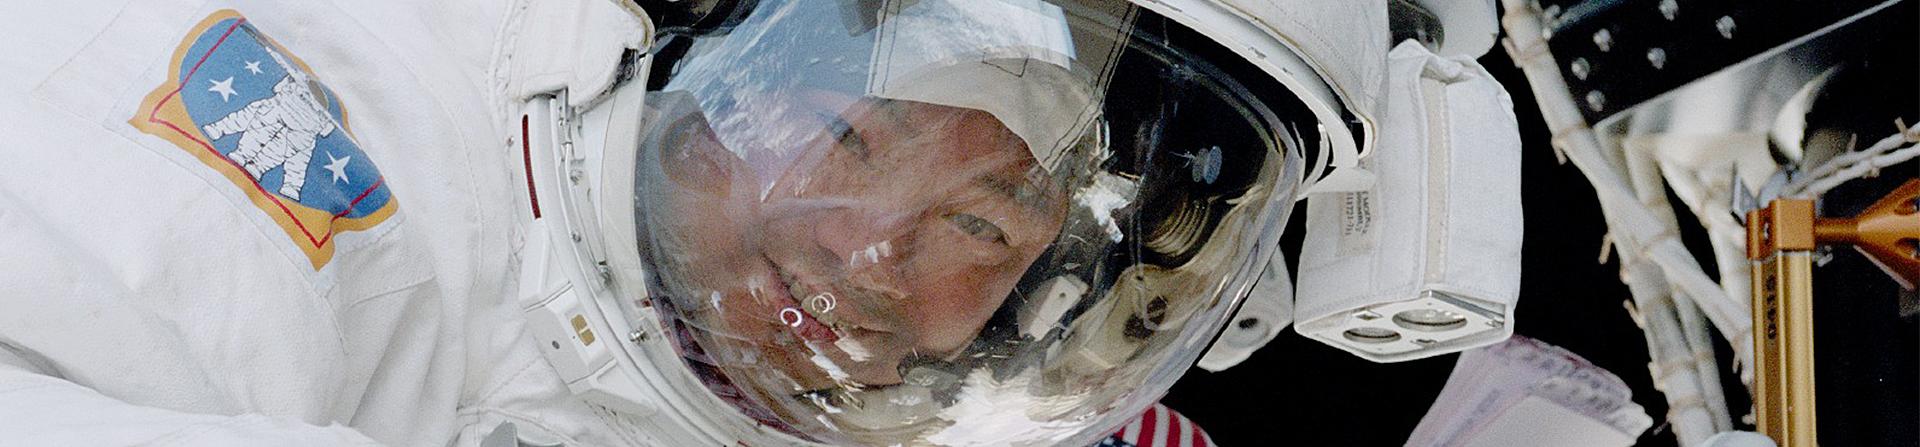 Space Medicine Leroy Chiao